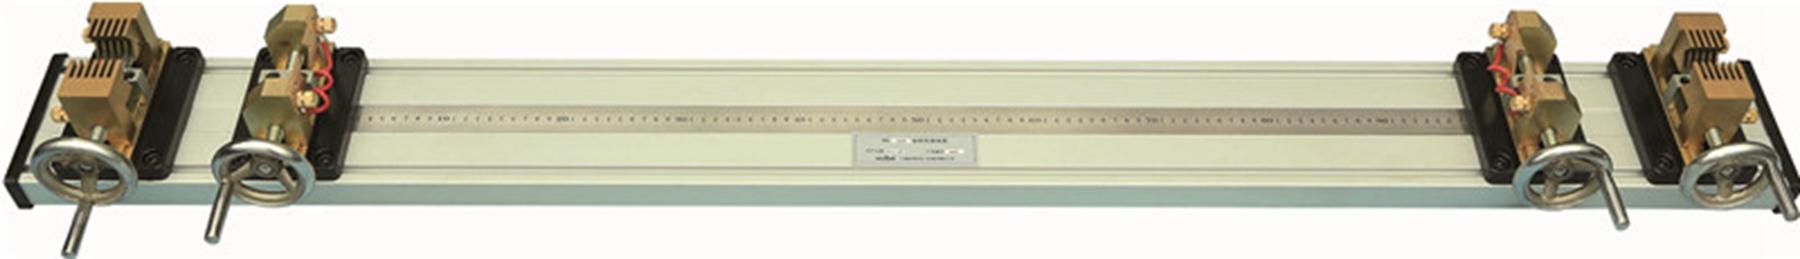 DQ-240型电桥专用夹具